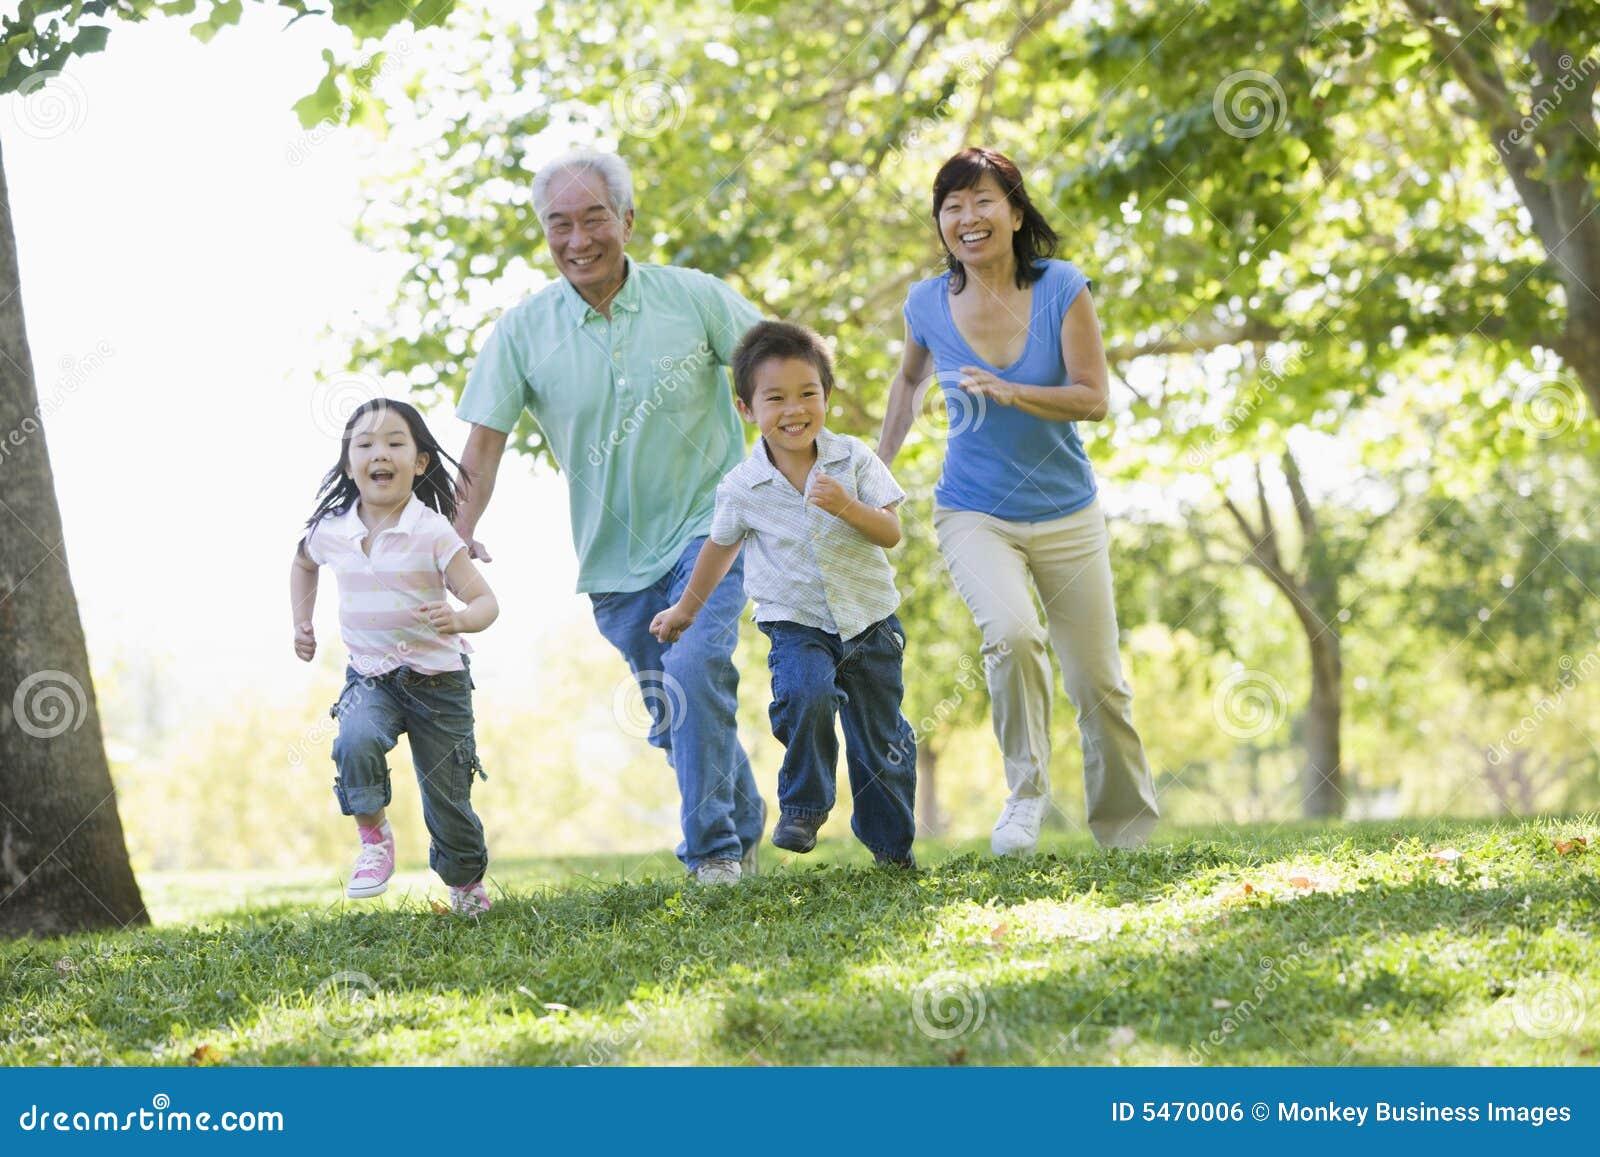 Grandchildren grandparents running